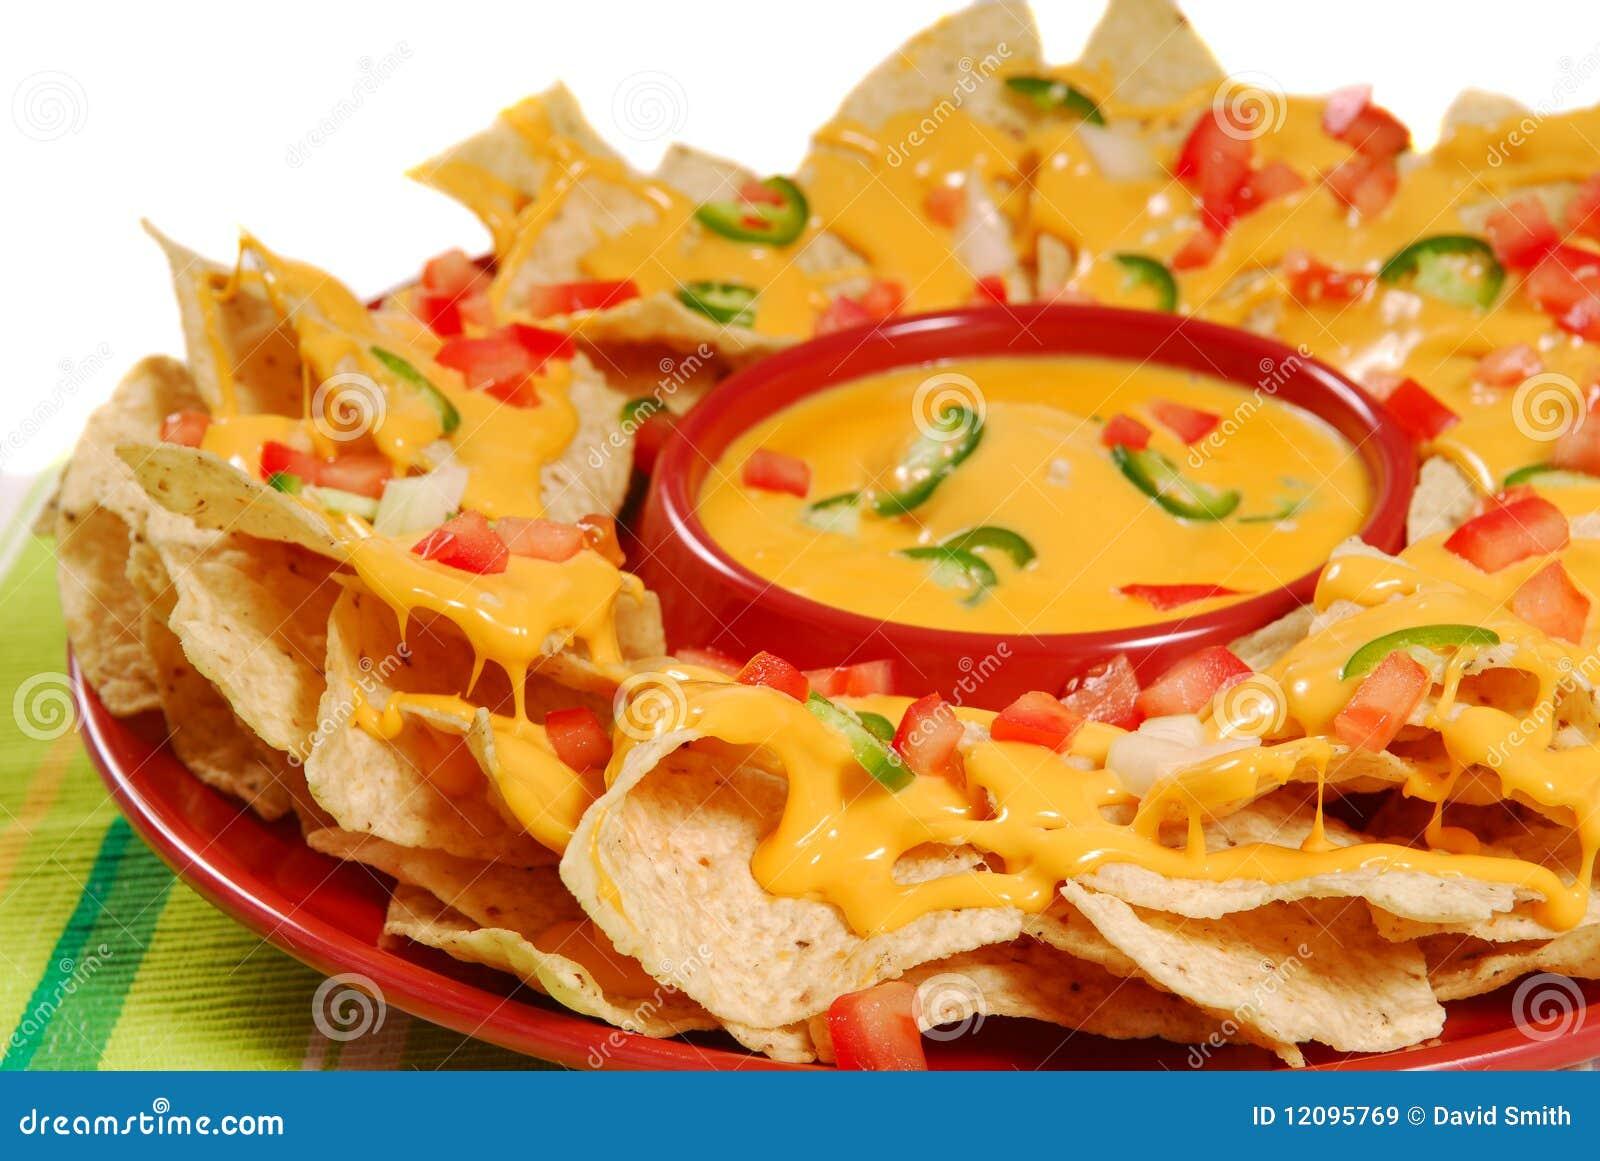 Plaque des nachos